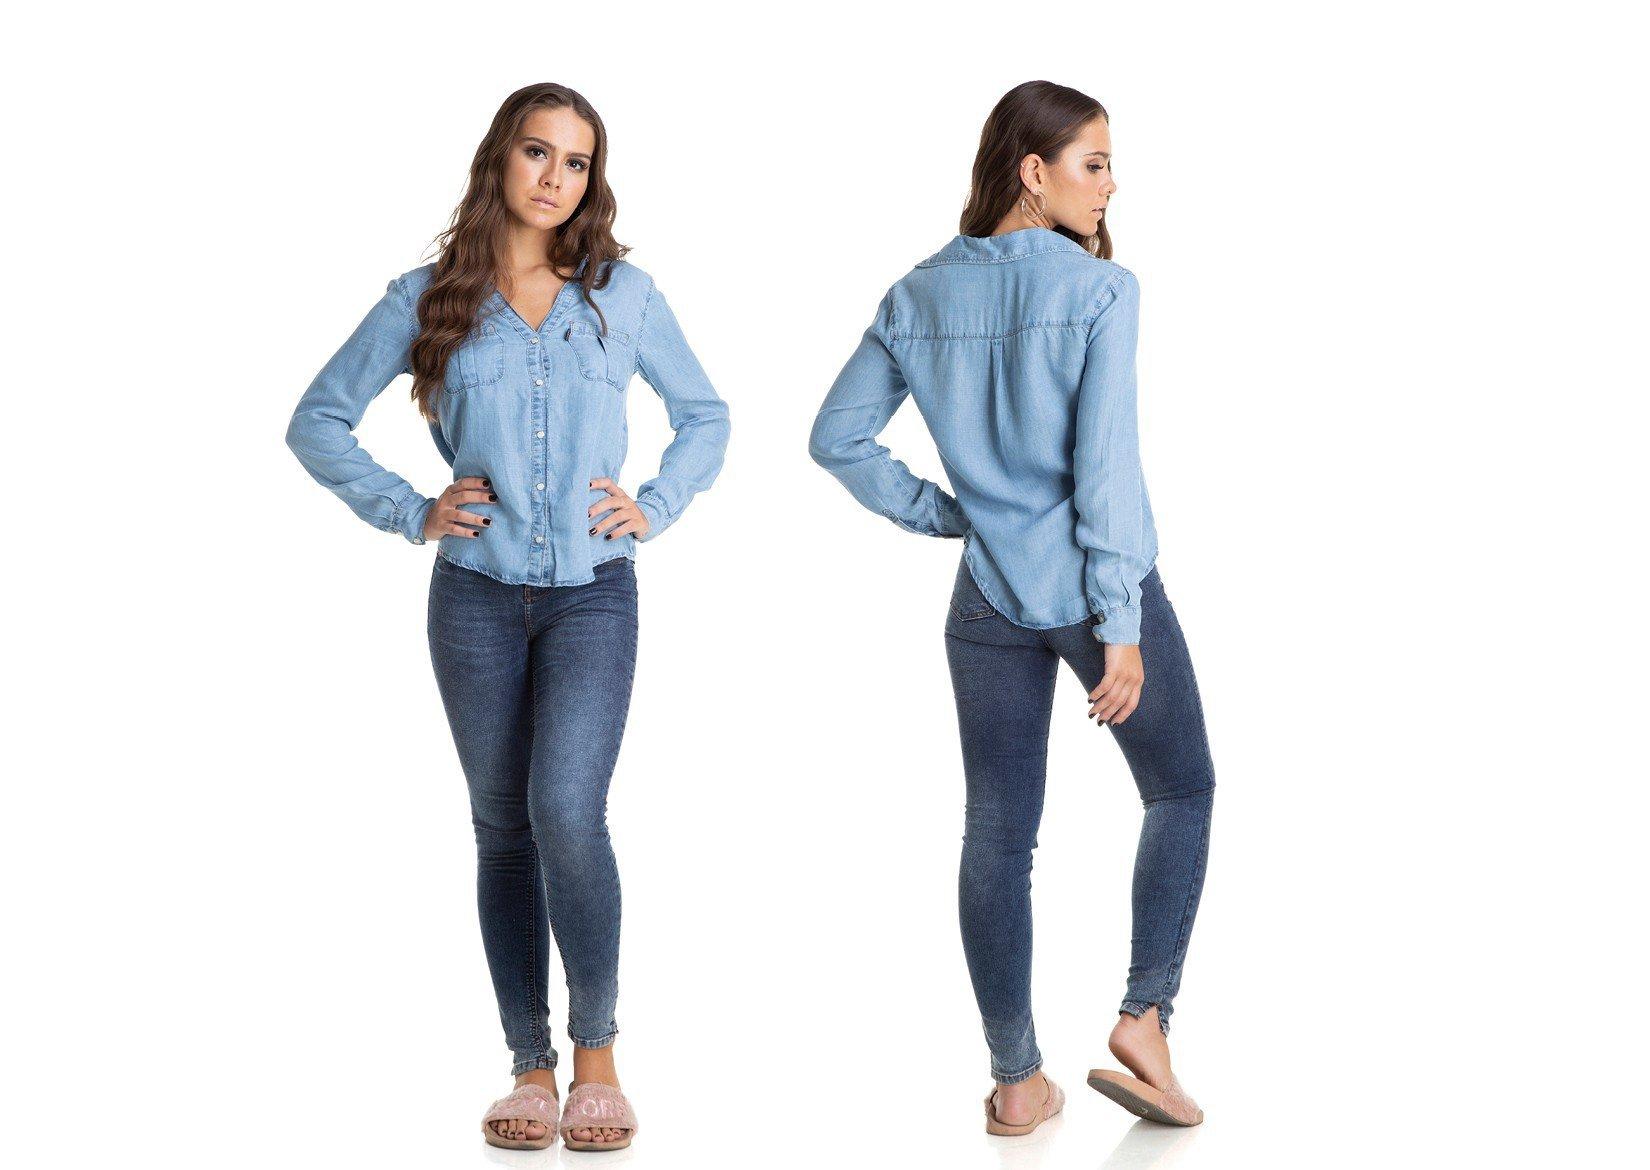 35ee42dd9f Camisa Jeans Feminina Manga Longa Solta Clara - DZ11137